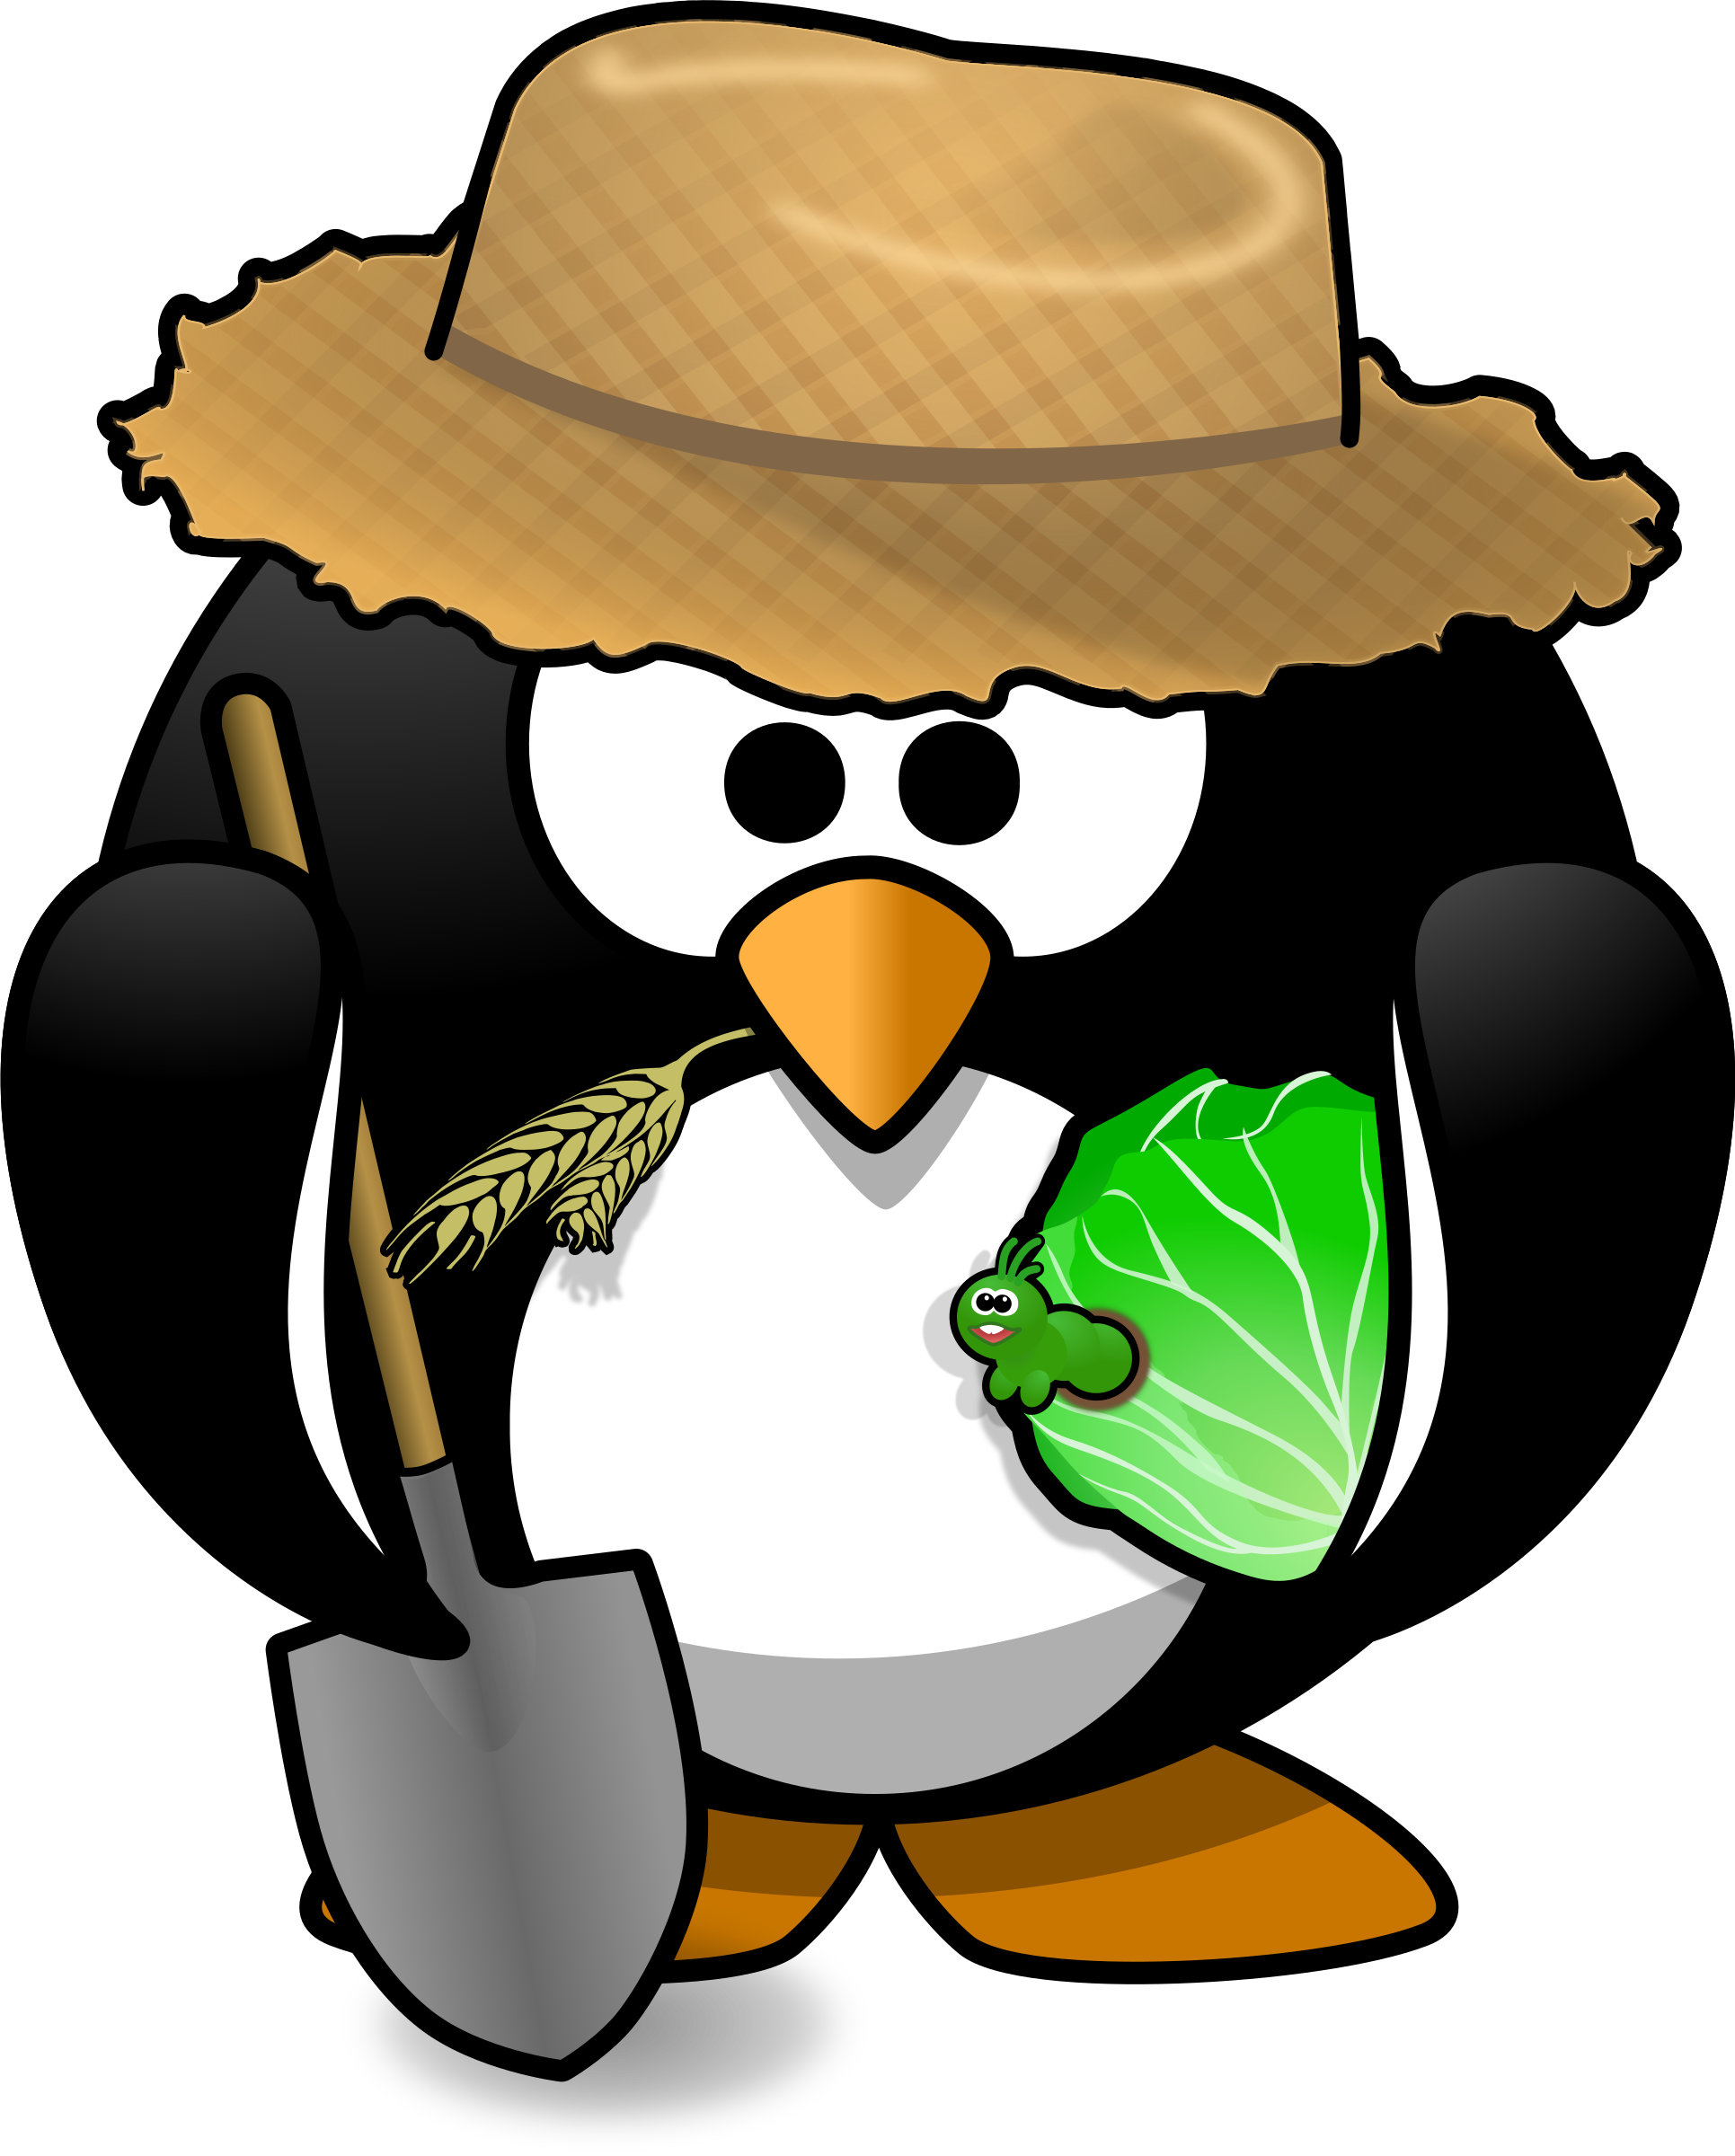 Penguin big image png. Picture clipart farmer